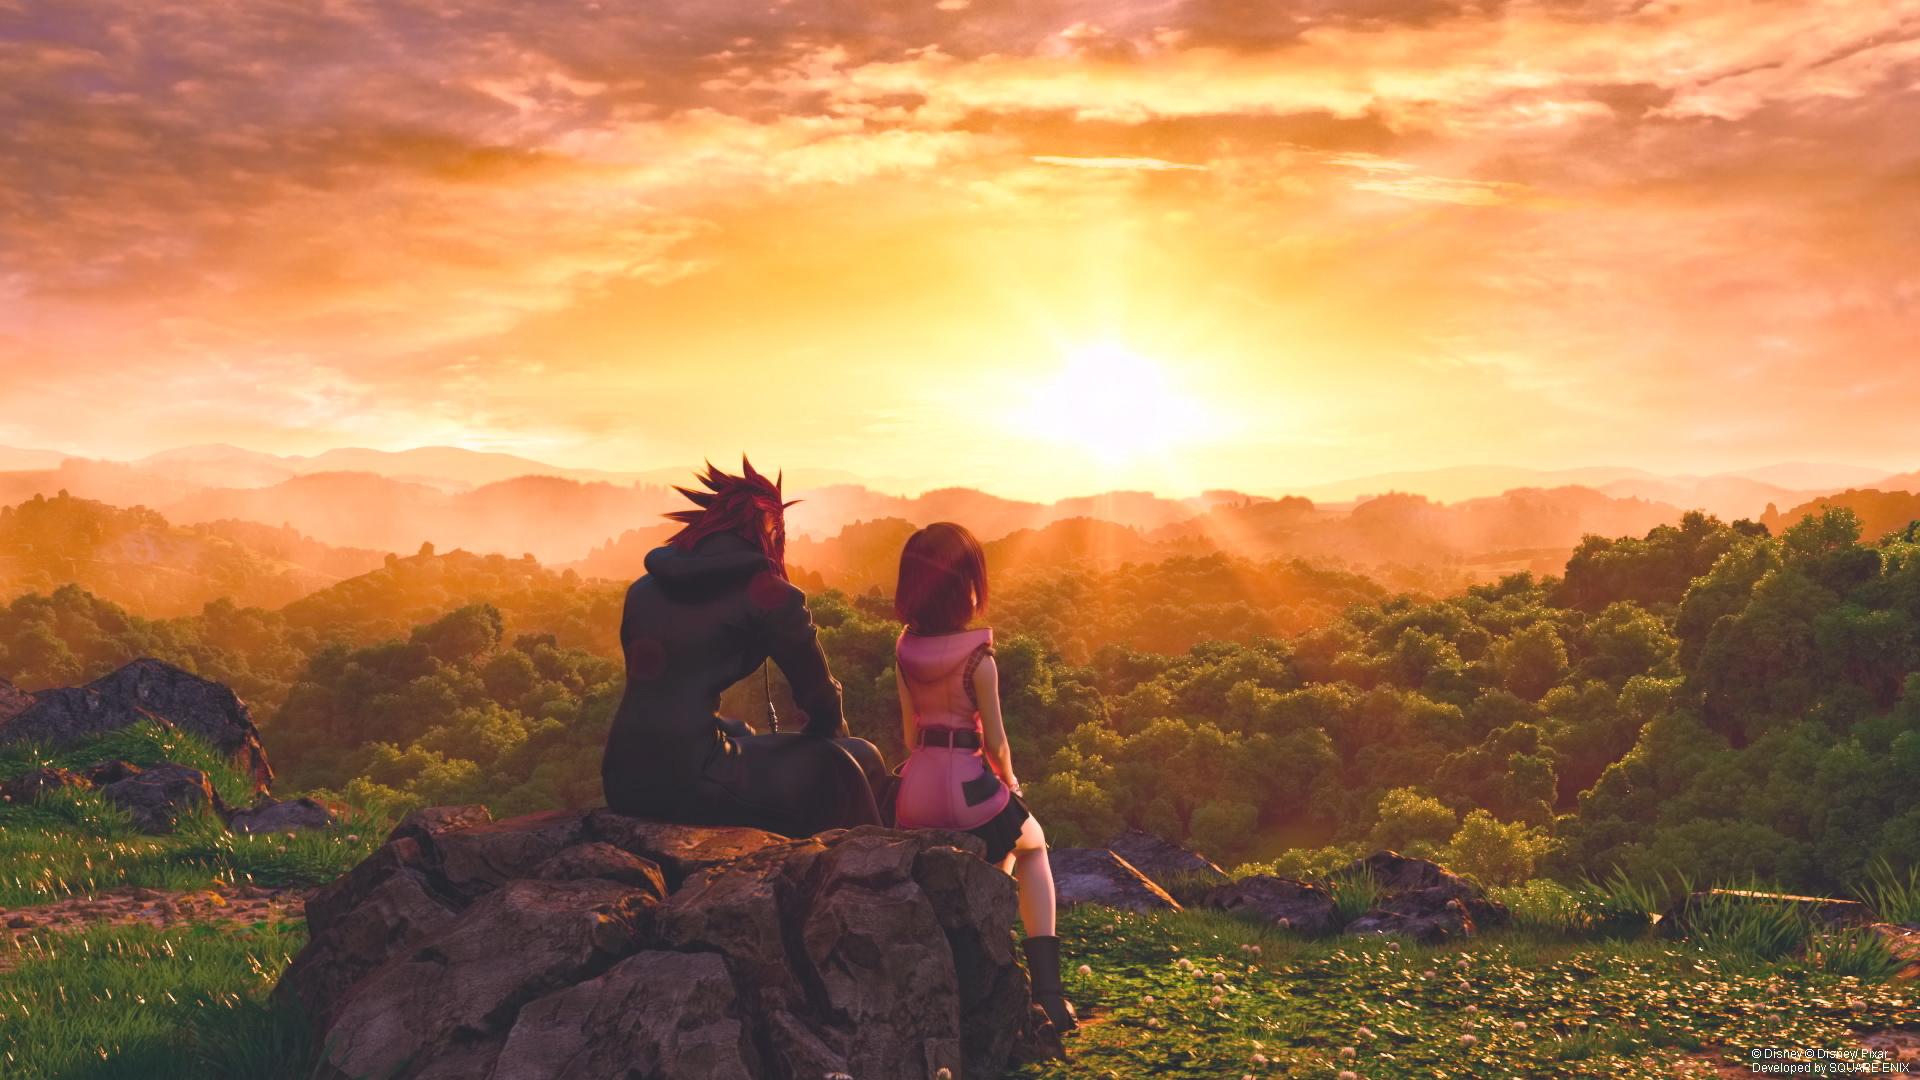 Utada Hikaru teams with Skrillex and Poo Bear for Kingdom Hearts ...